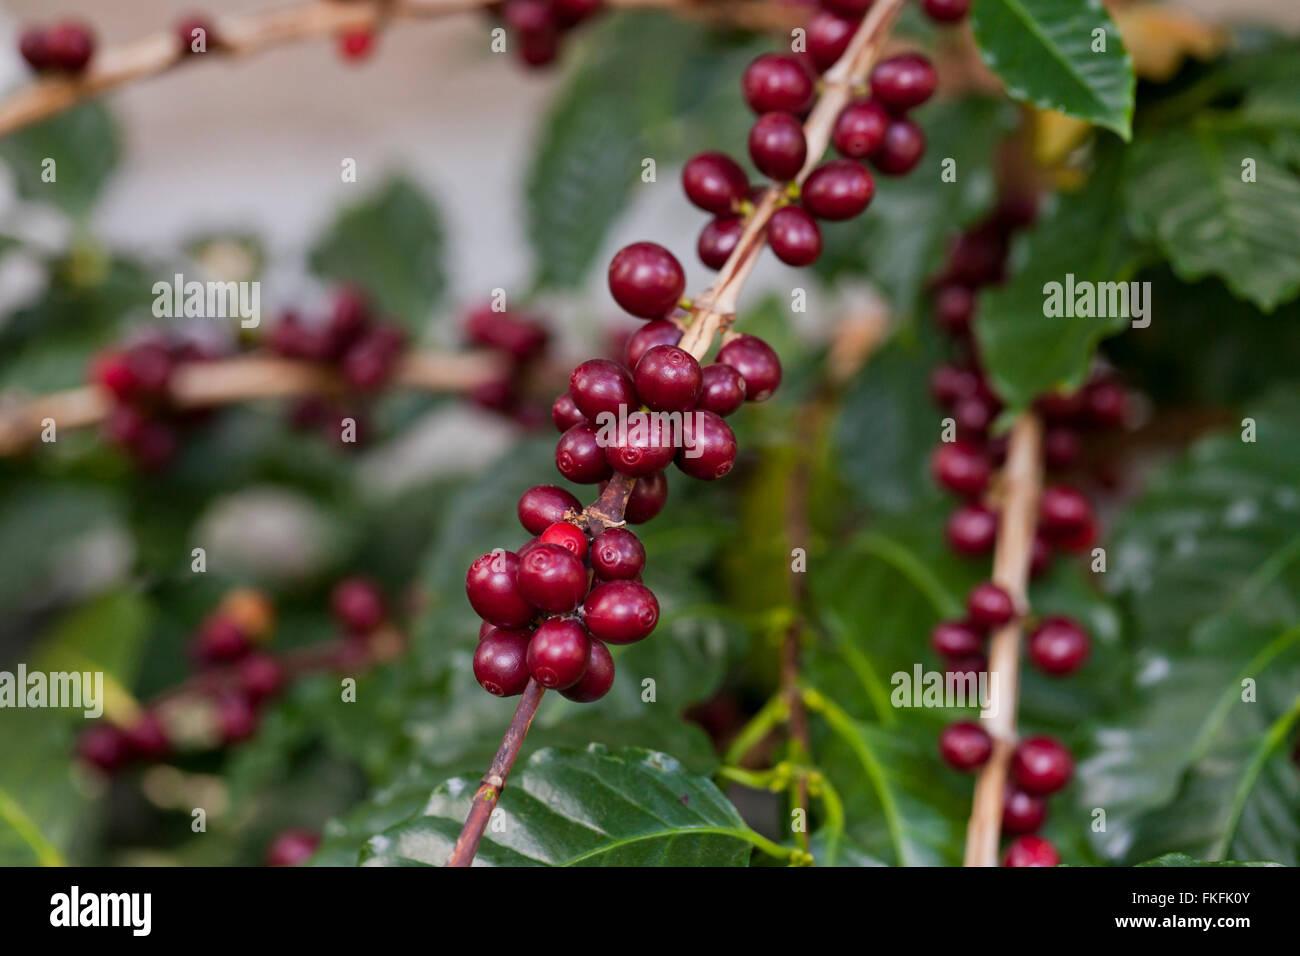 Coffee fruits on plant (coffea arabica) - Stock Image